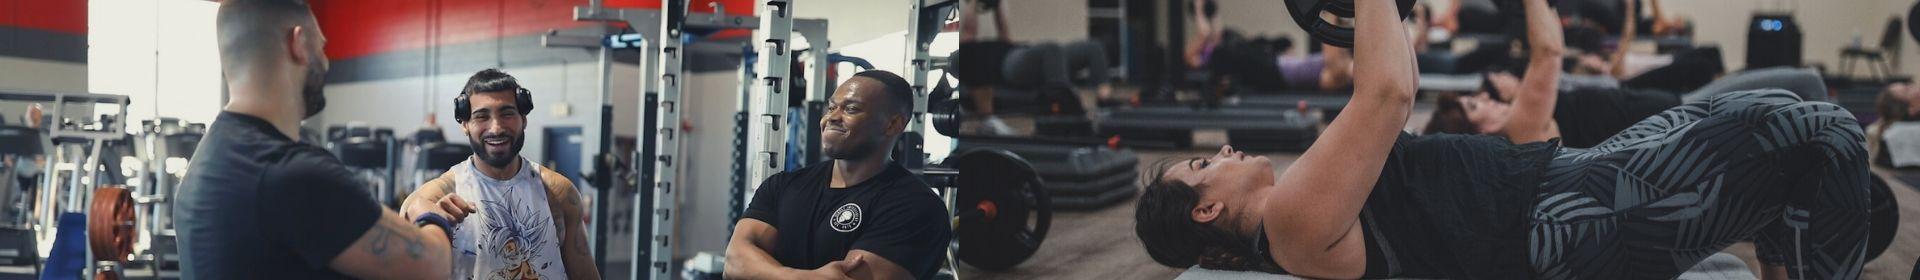 Razor Sharp Fitness Gym and Community